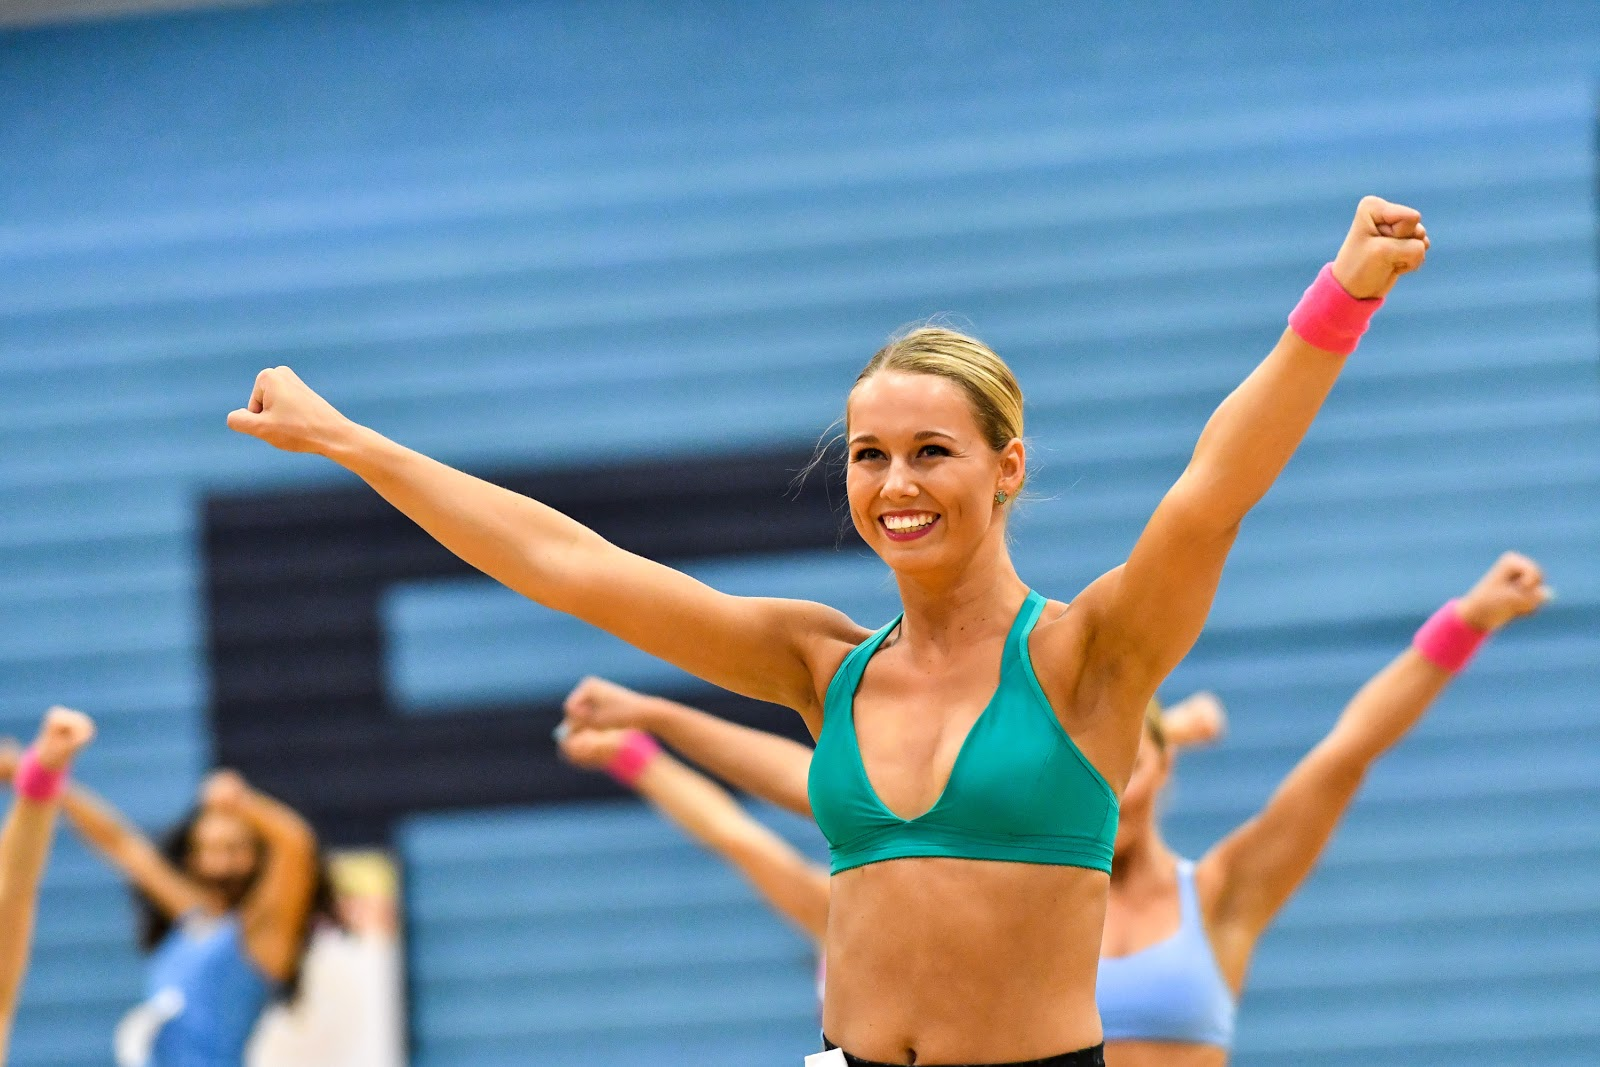 college dance team audition